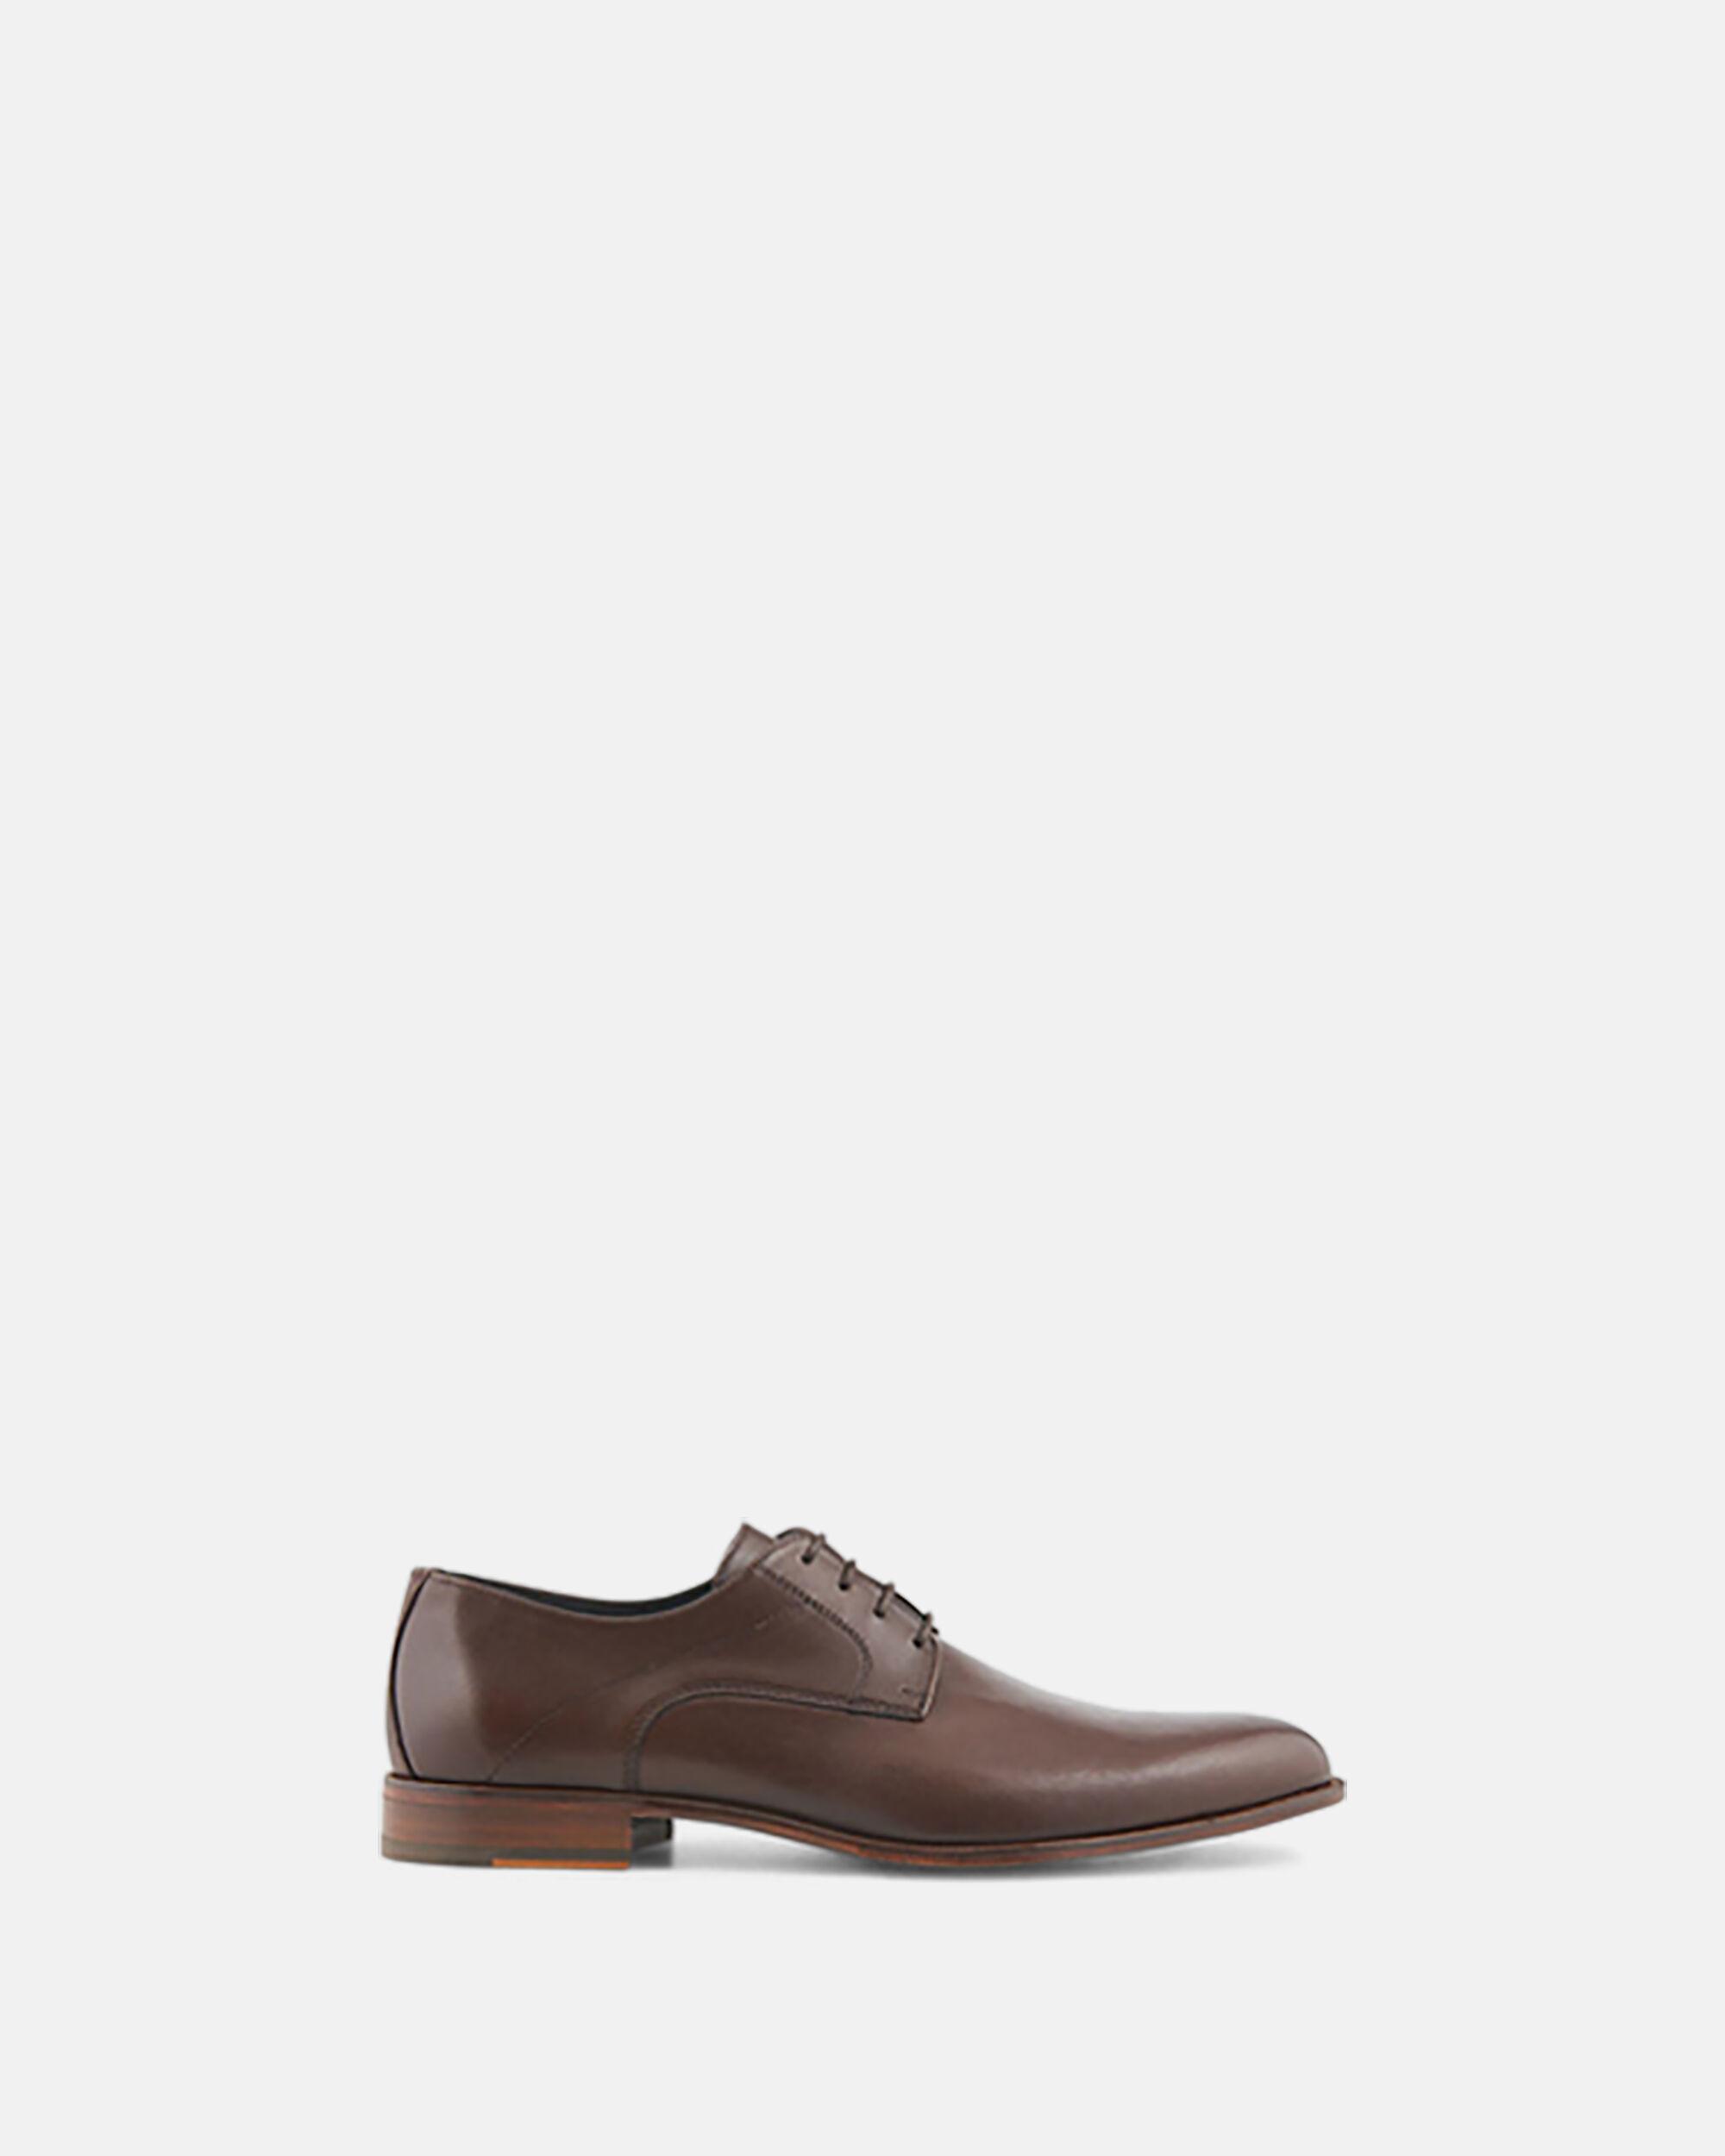 Cuir Derby Veau Chaussures Keith Derby Keith WIDH29E